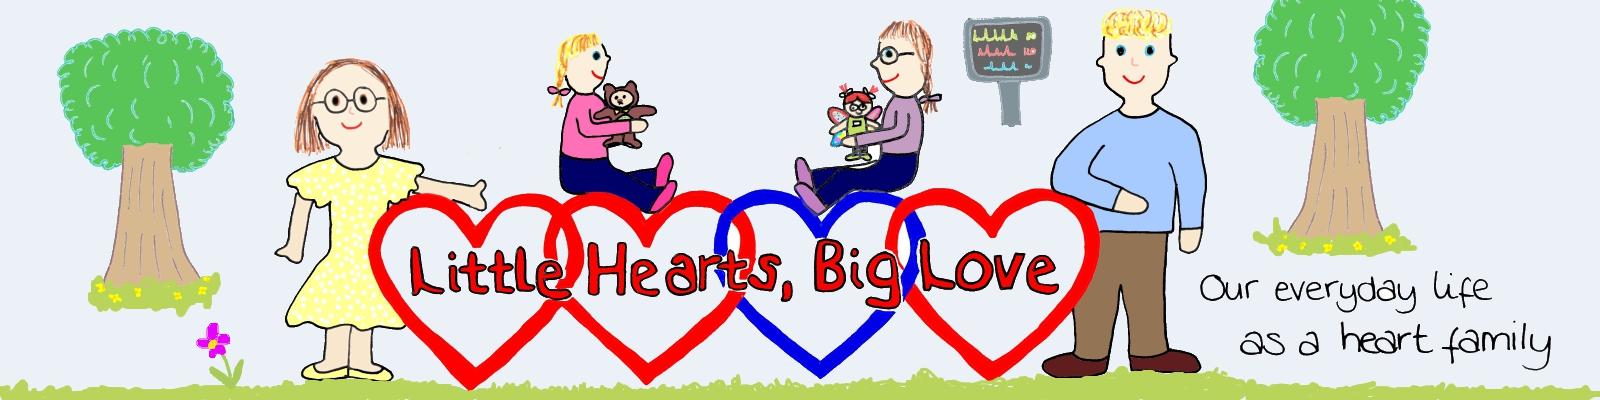 Little Hearts, Big Love